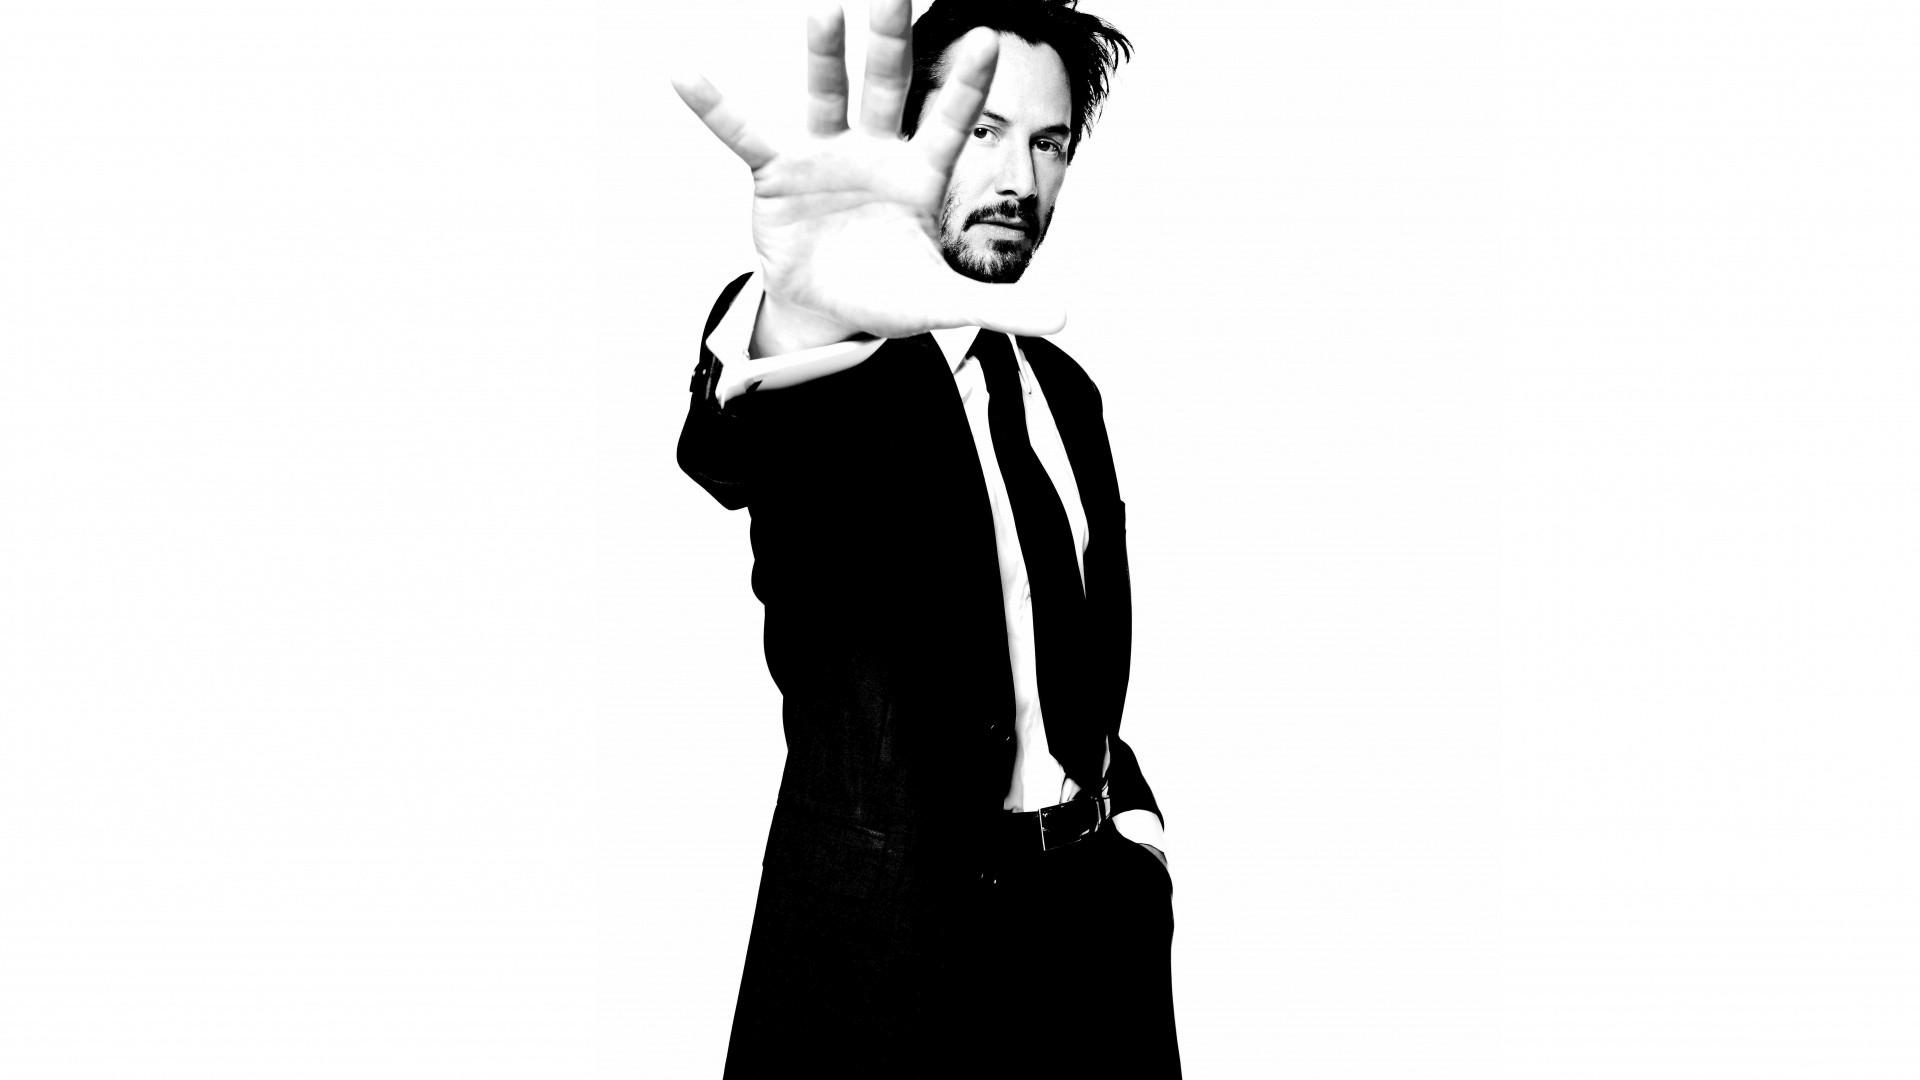 Keanu Reeves hd wallpaper download